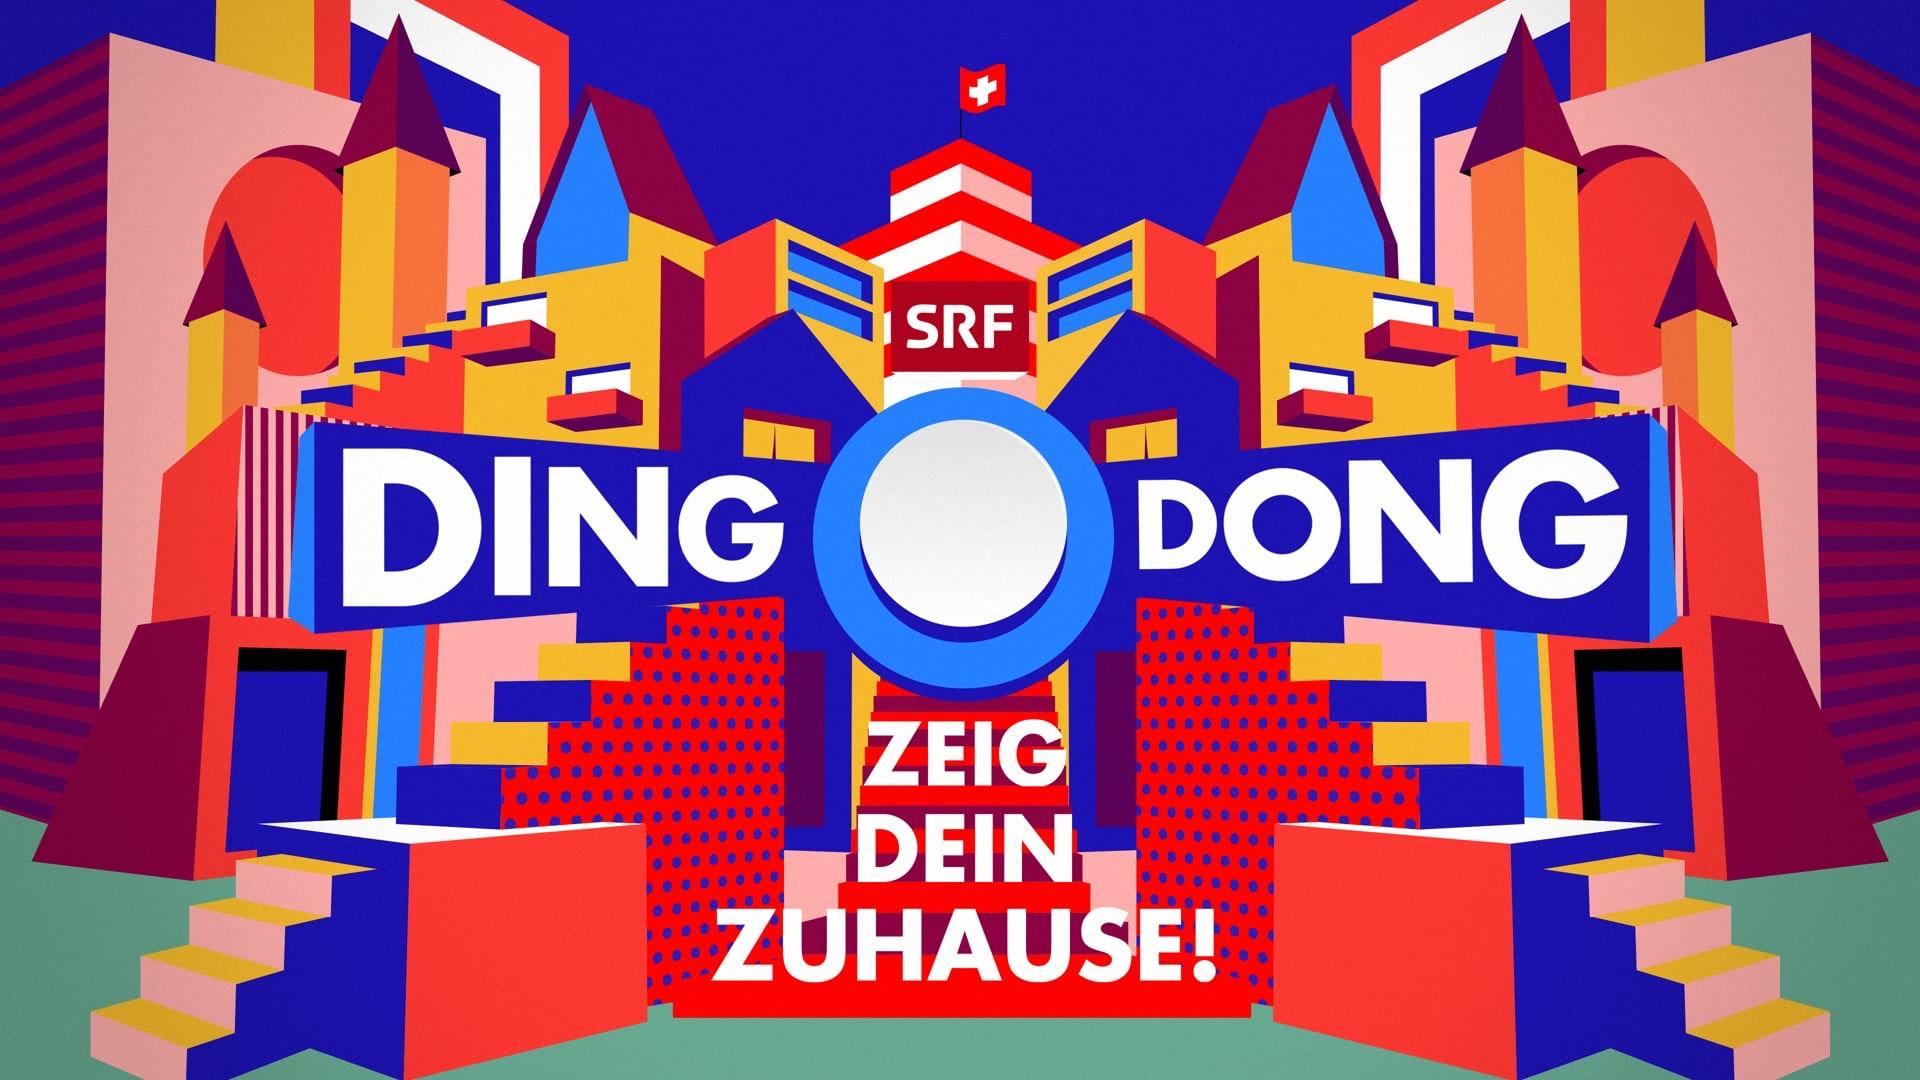 SRF Ding Dong